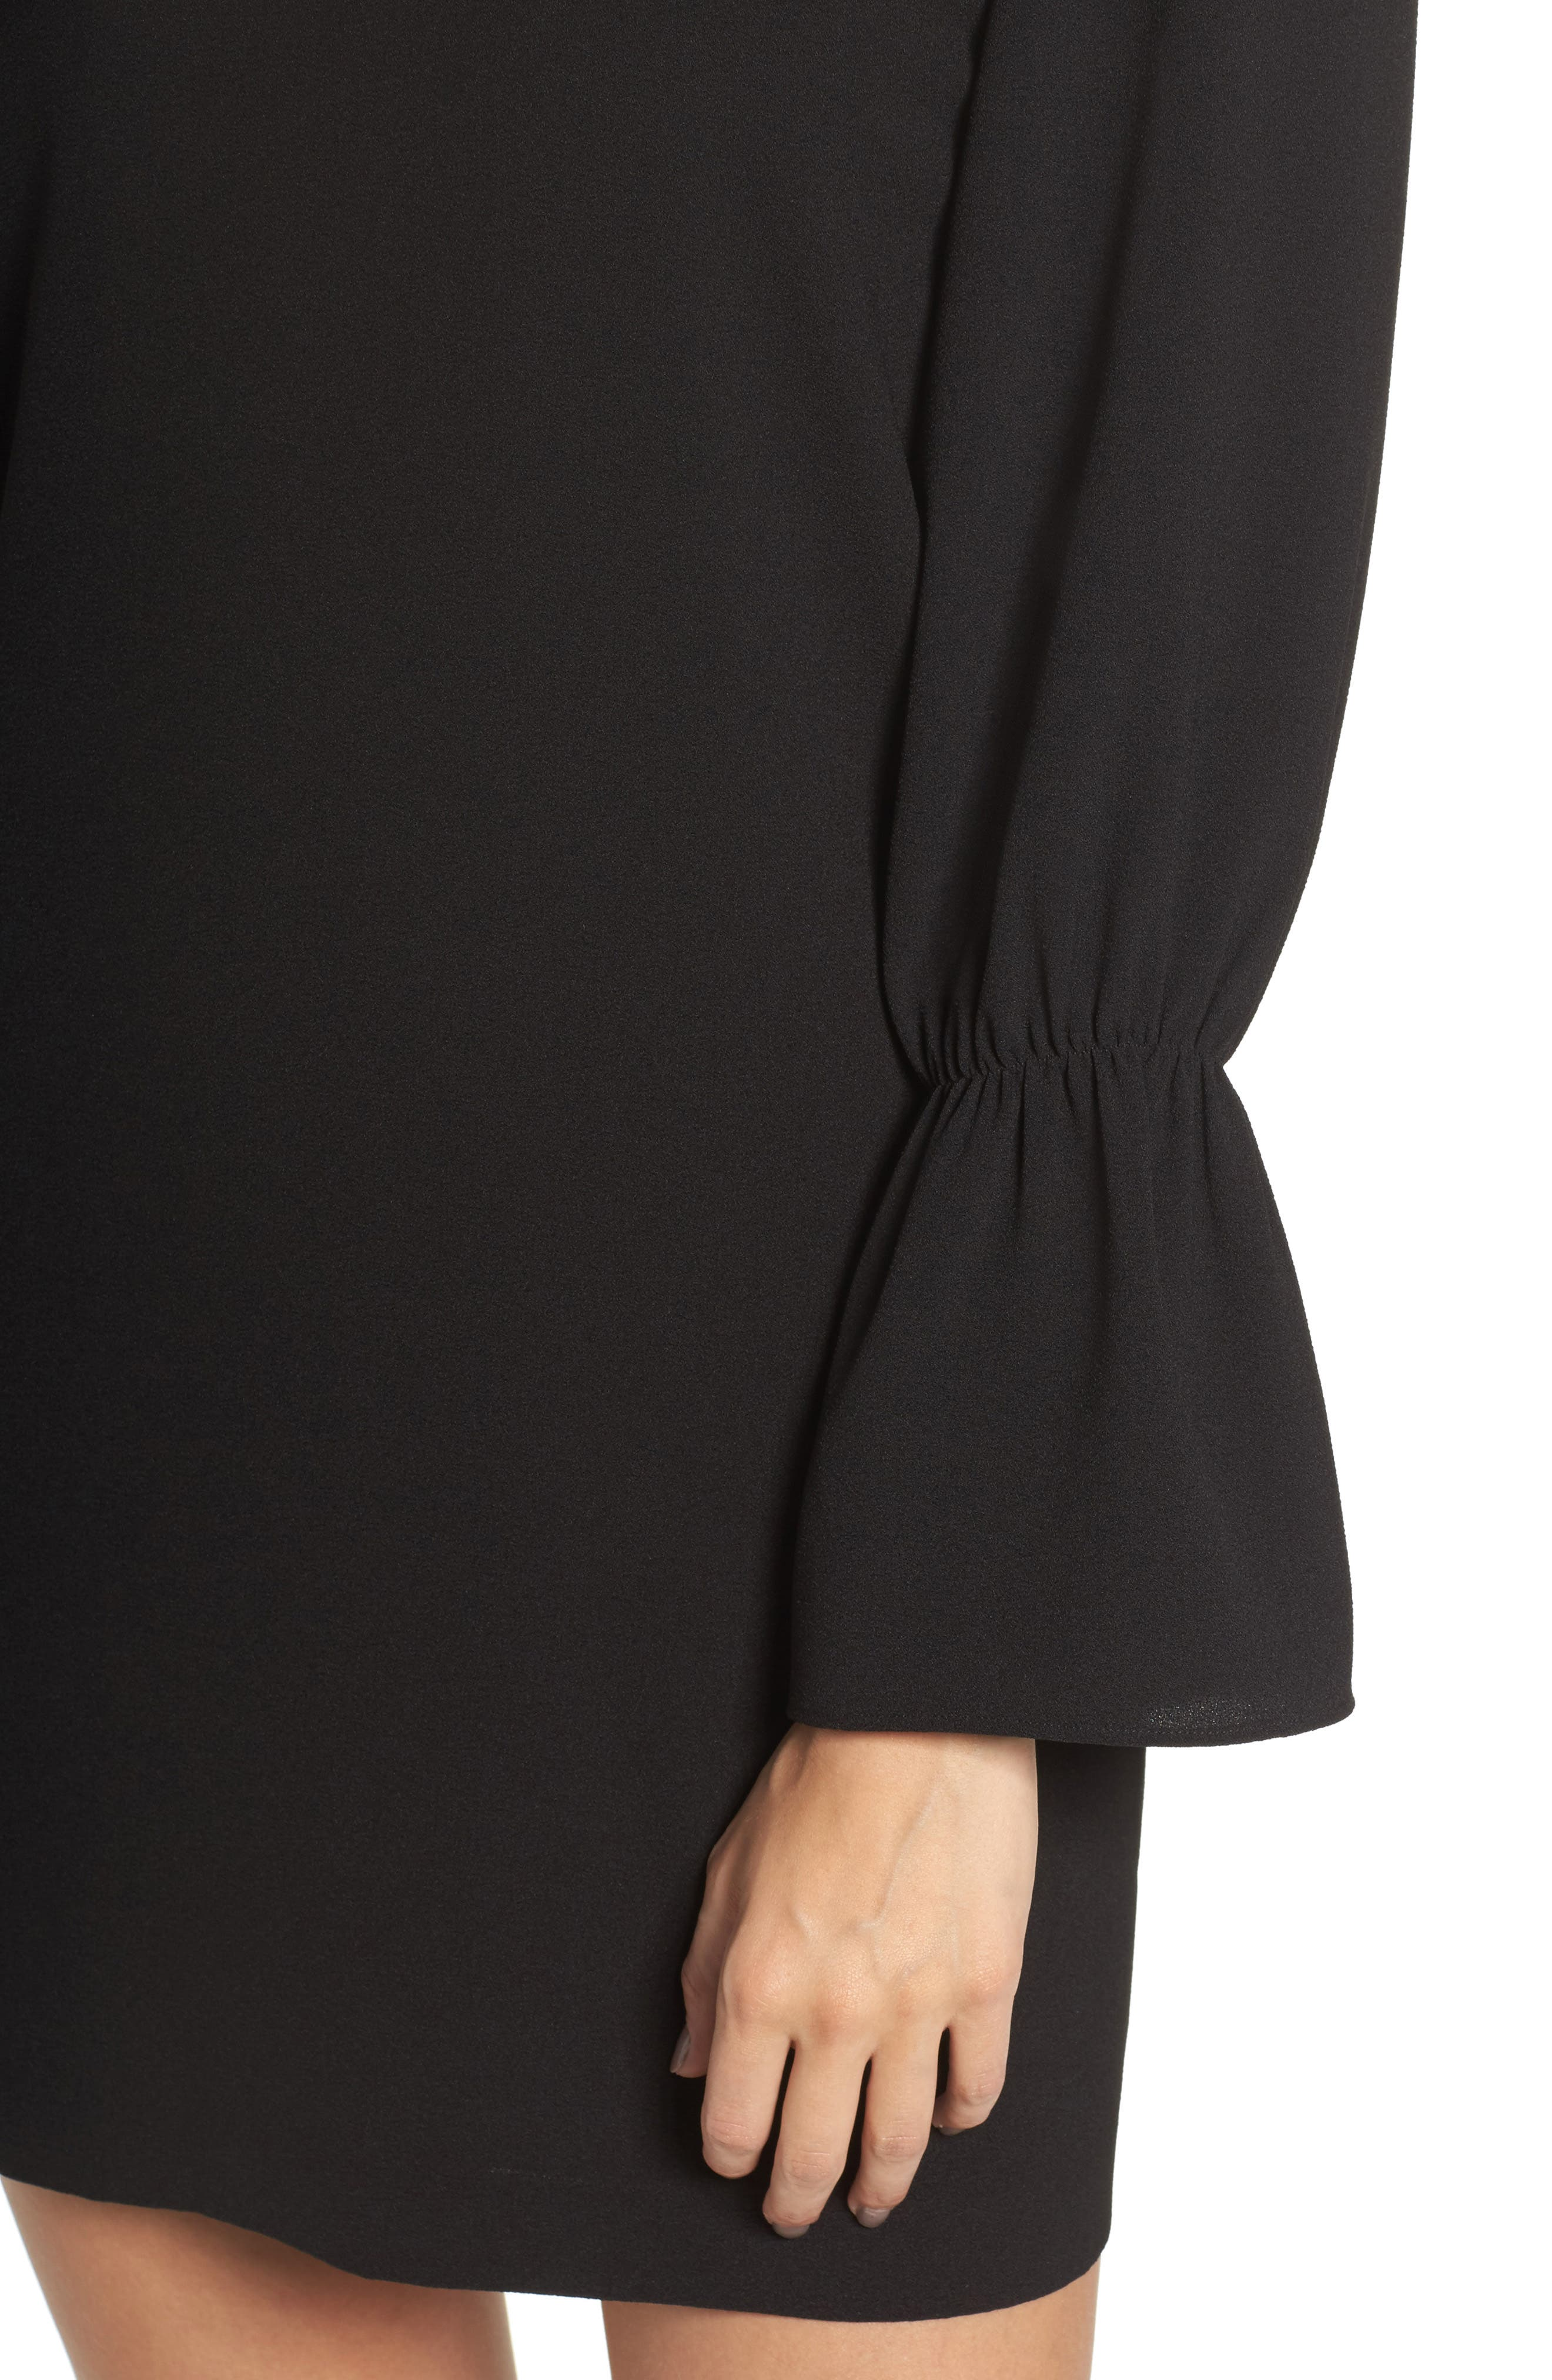 Alternate Image 4  - Felicity & Coco Farrah Cross Back Minidress (Nordstrom Exclusive)